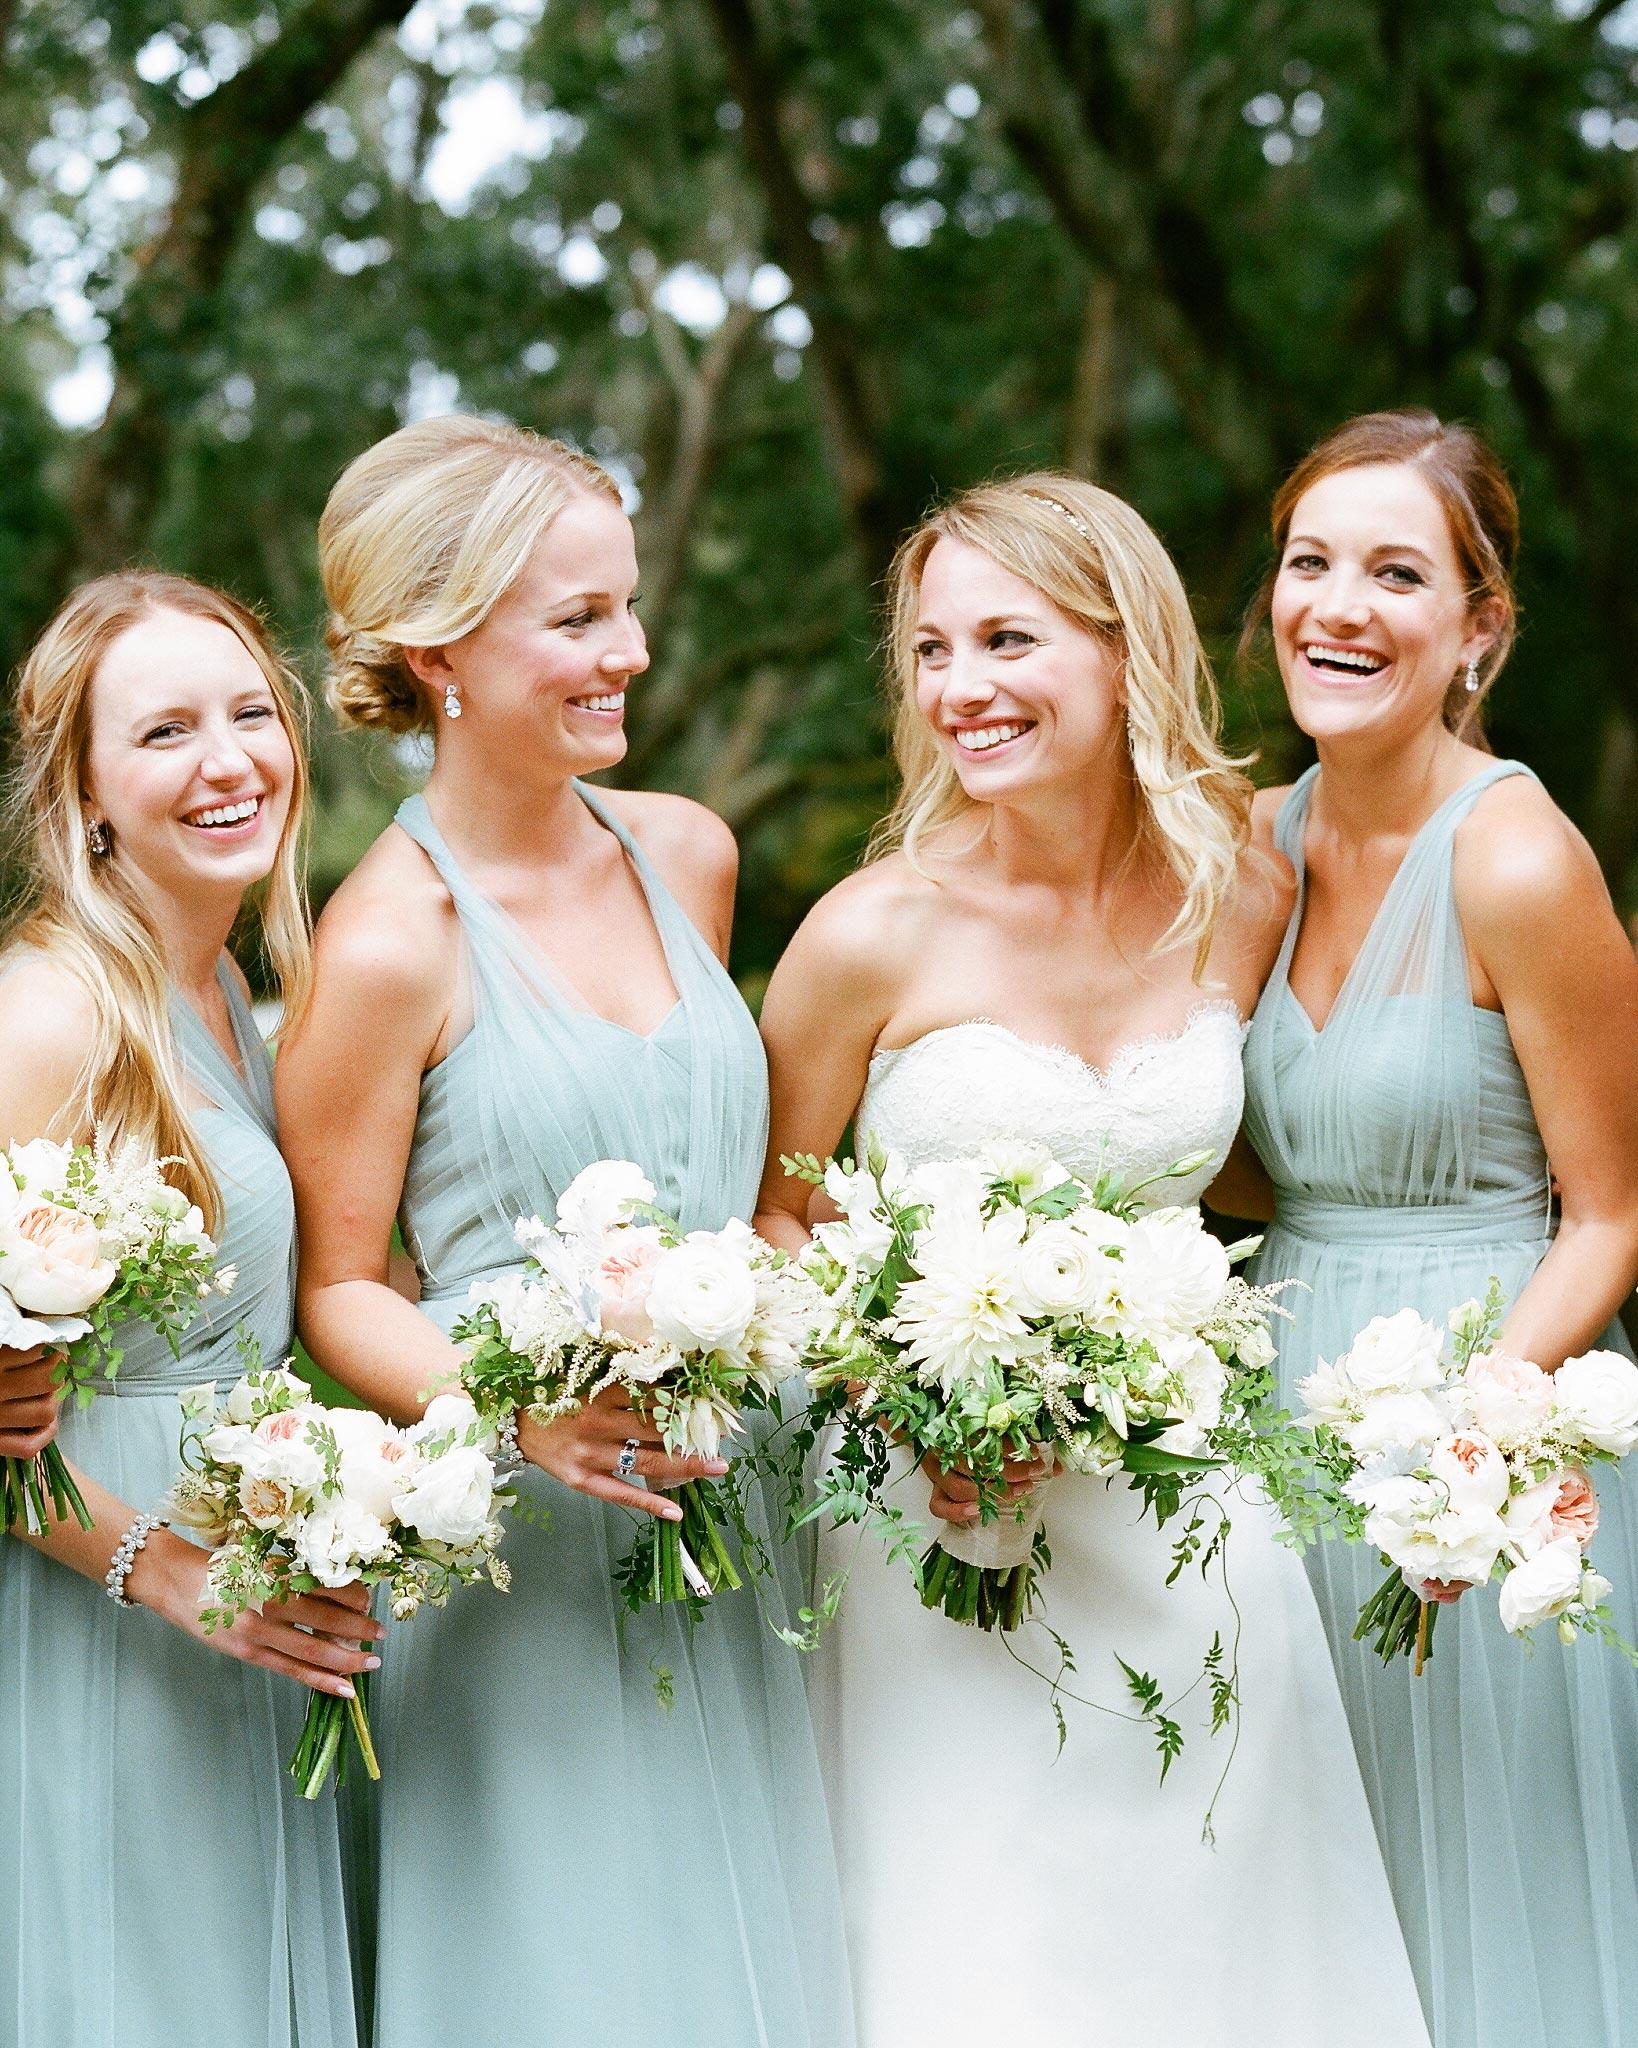 bridal-party-candids-10-0416.jpg